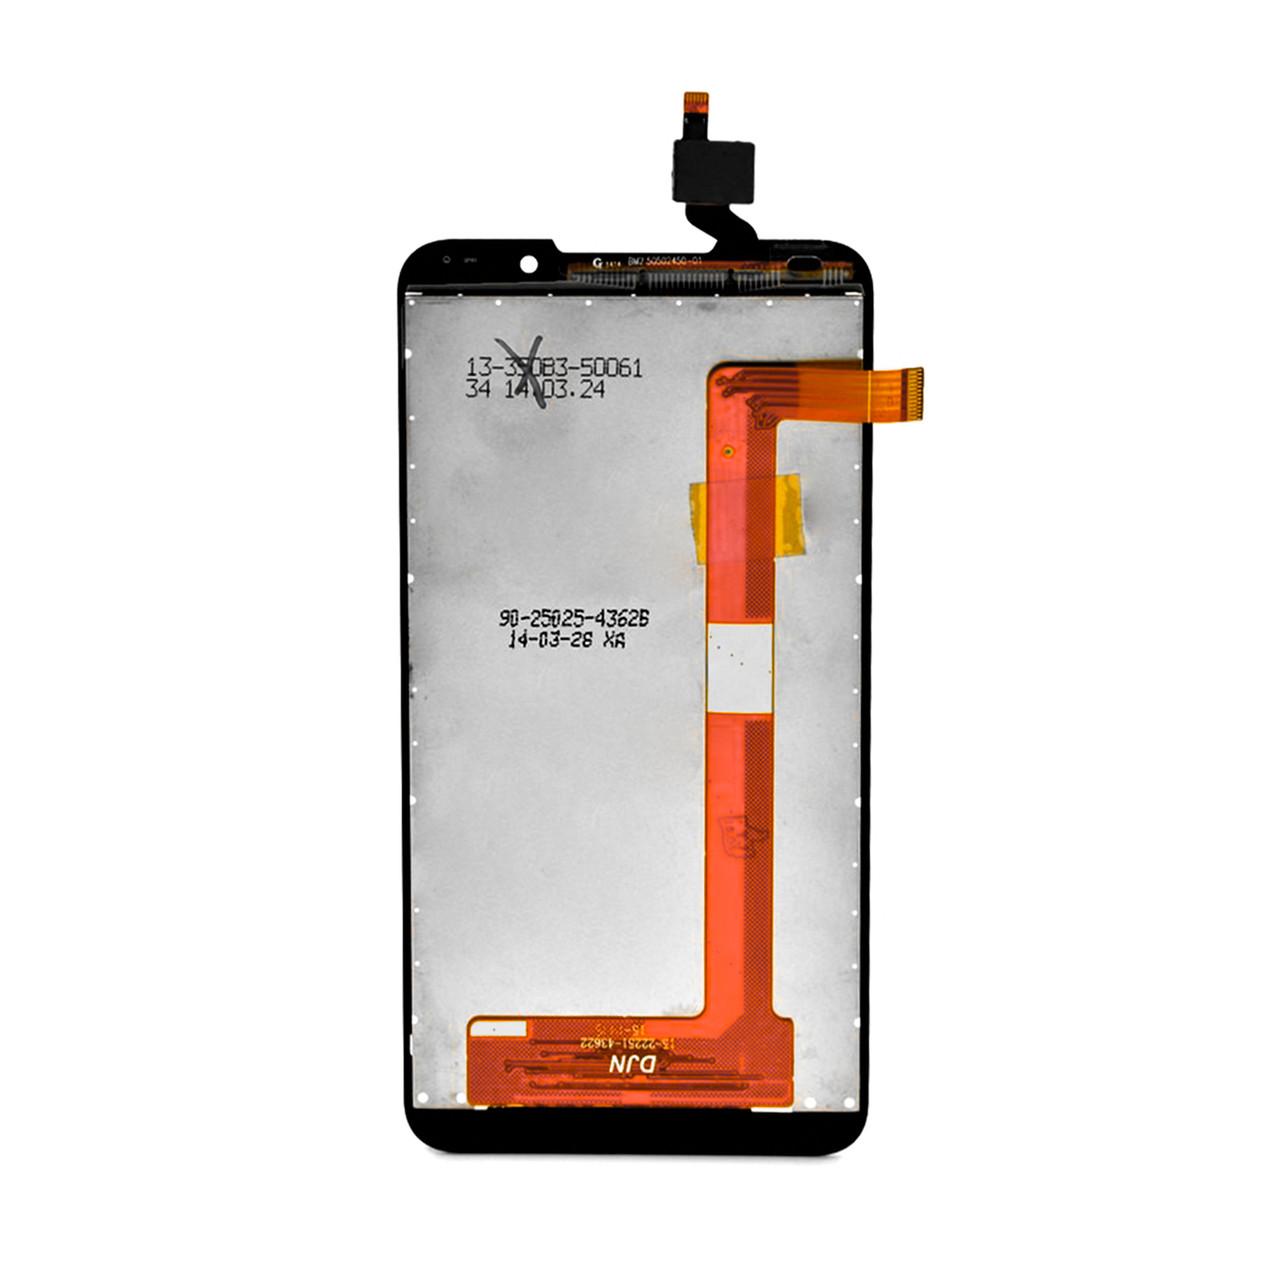 Дисплей HTC Desire 516 в сборе Black (31)